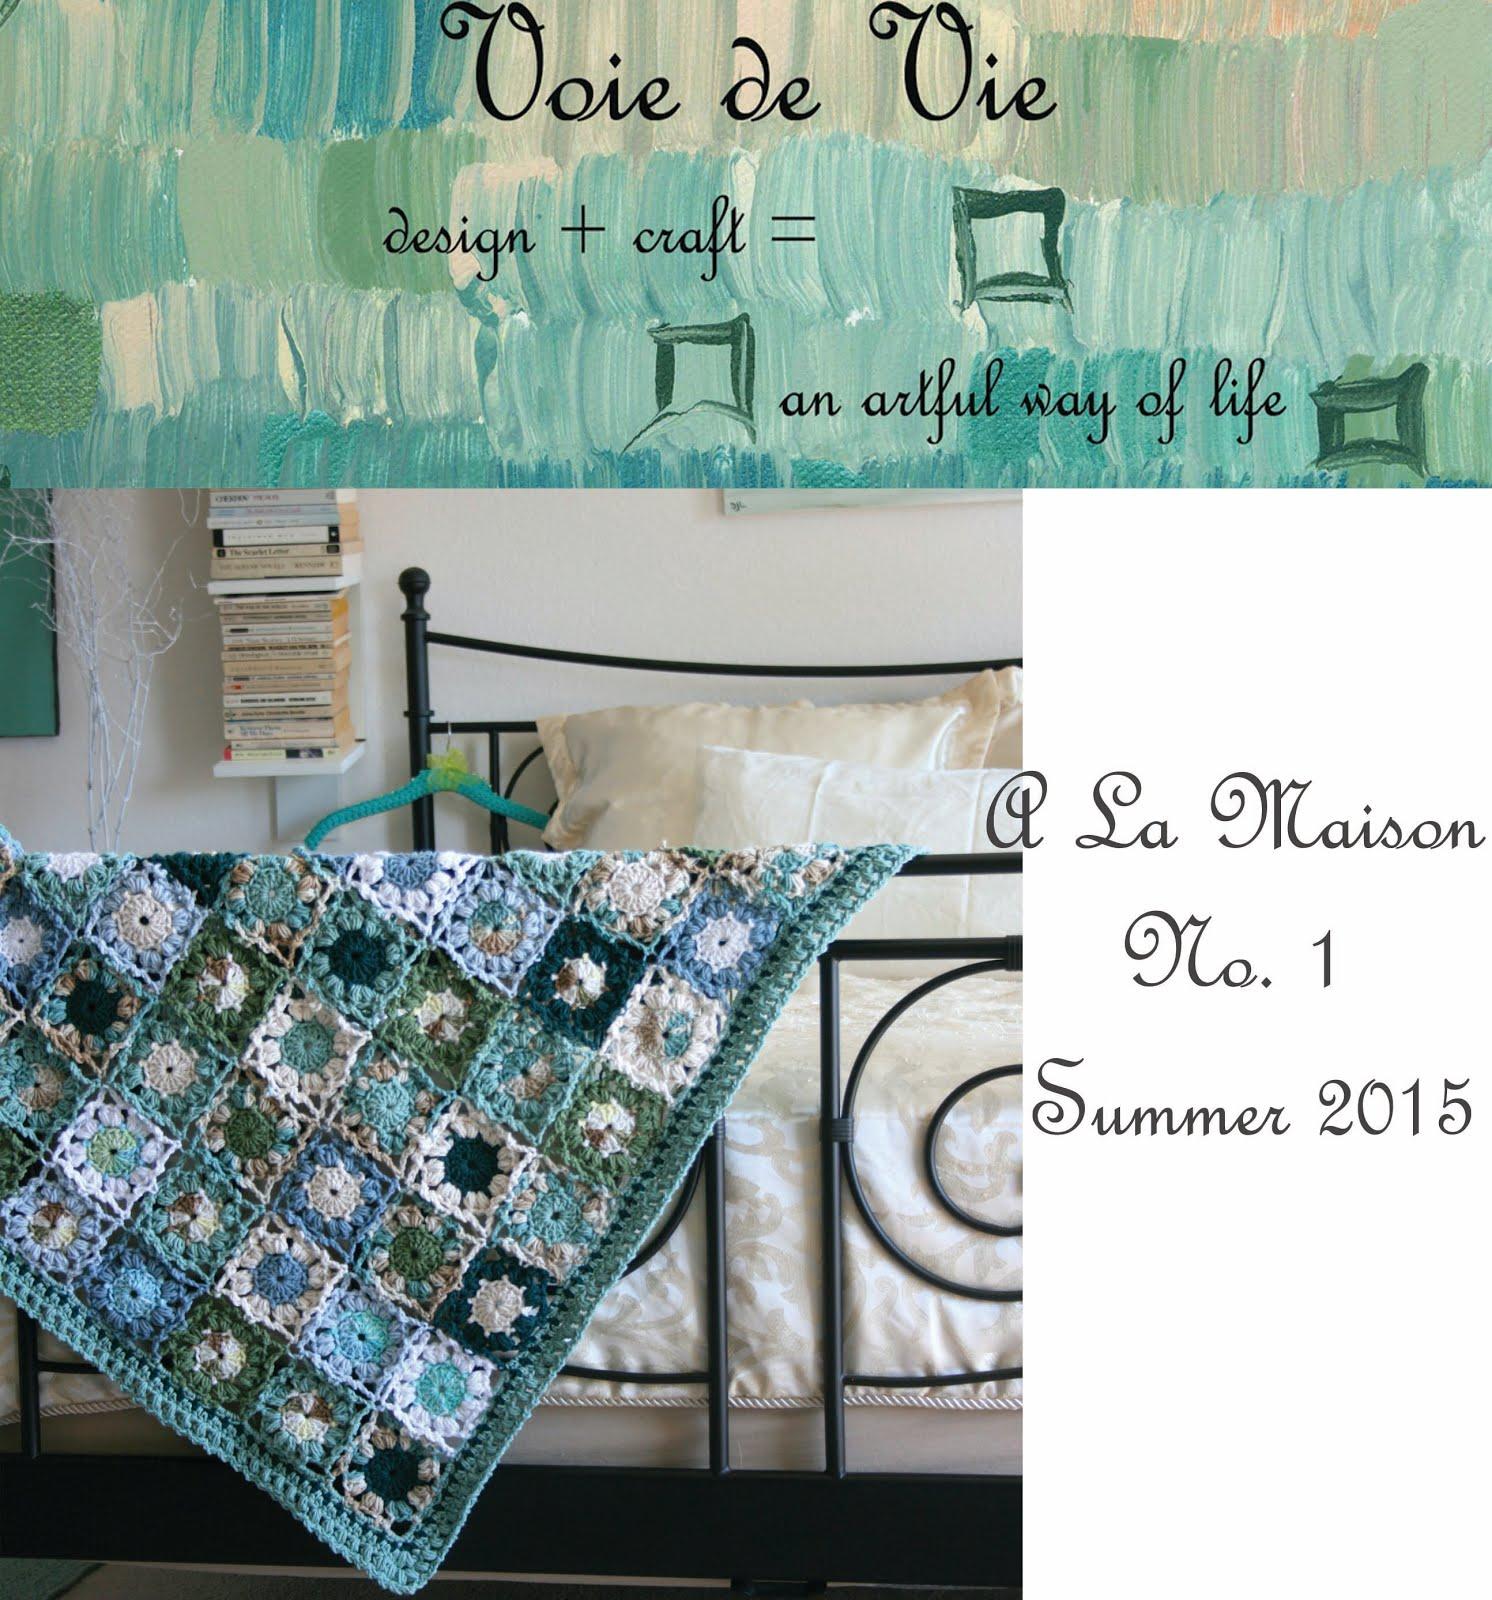 A La Maison No. 1: Summer 2015